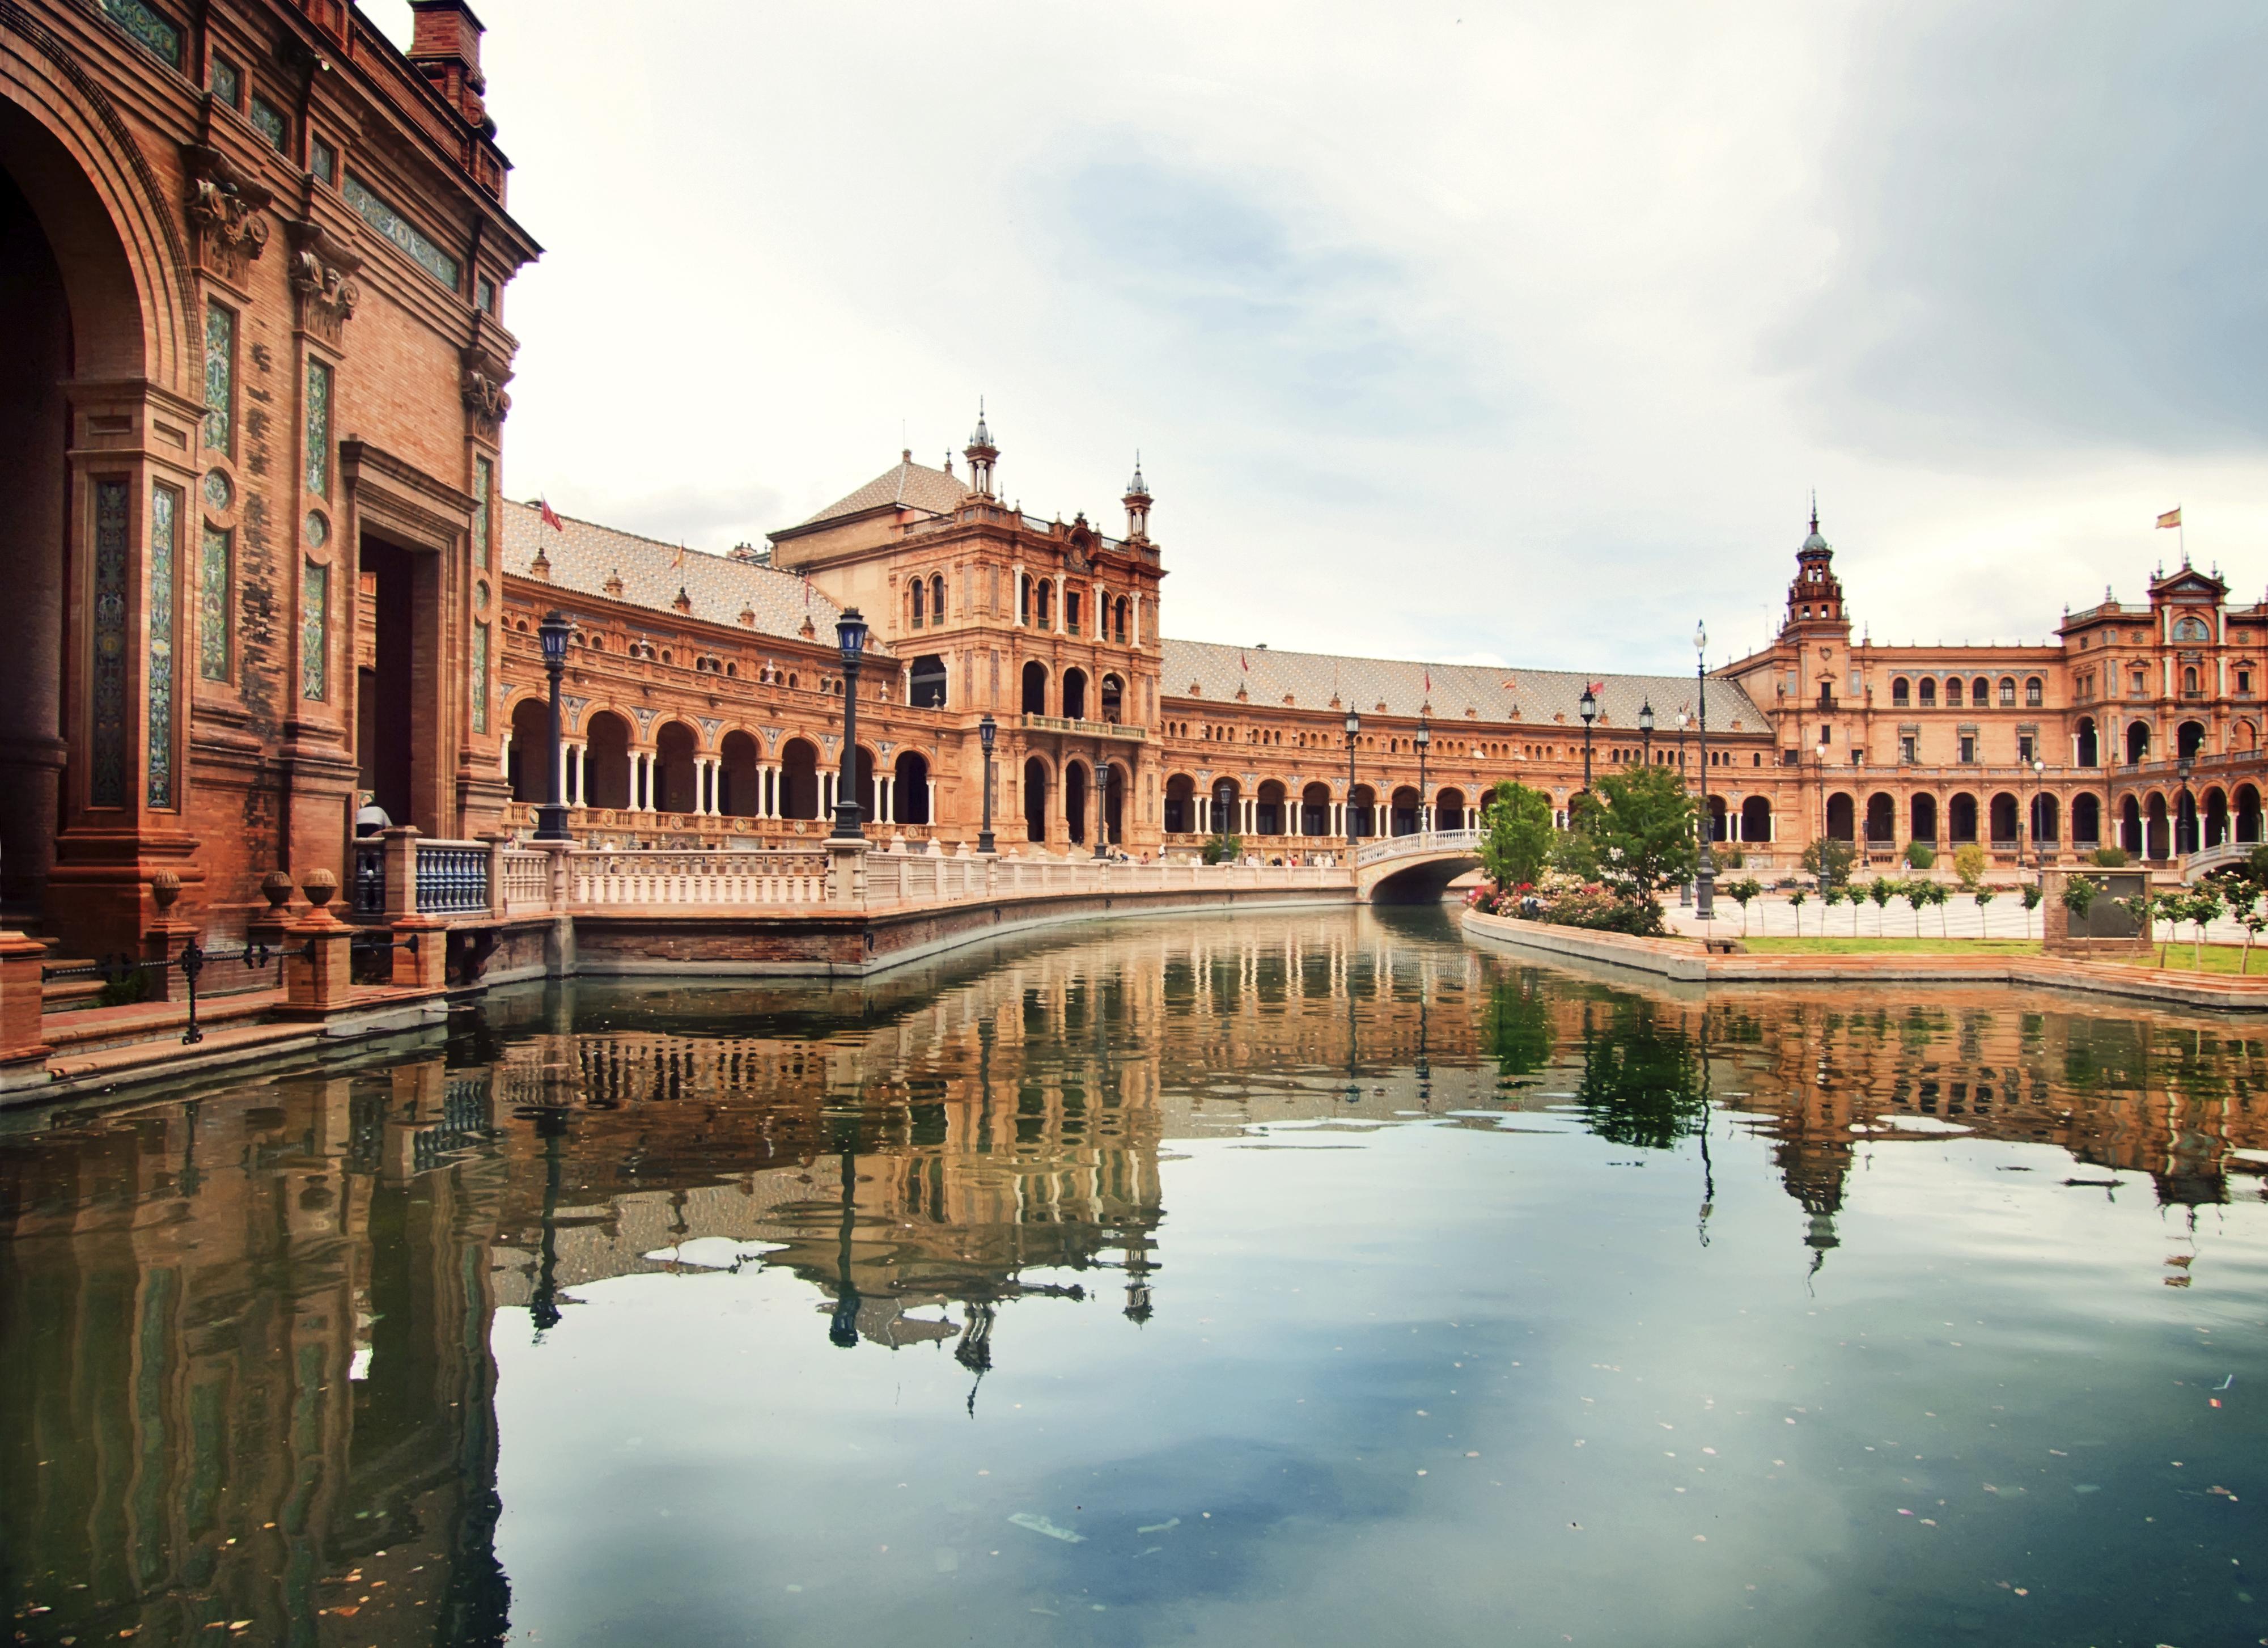 #1 Real Alcázar de Sevilla